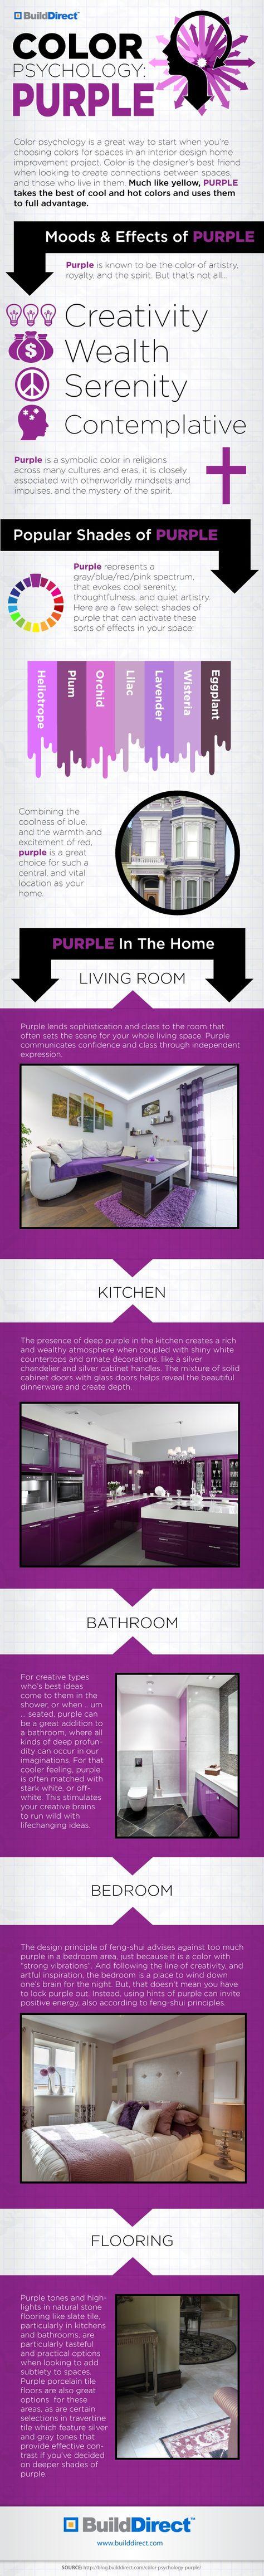 Color Psychology Purple copy Emotional Interior Design: Using Purple. My eldest loves purple.